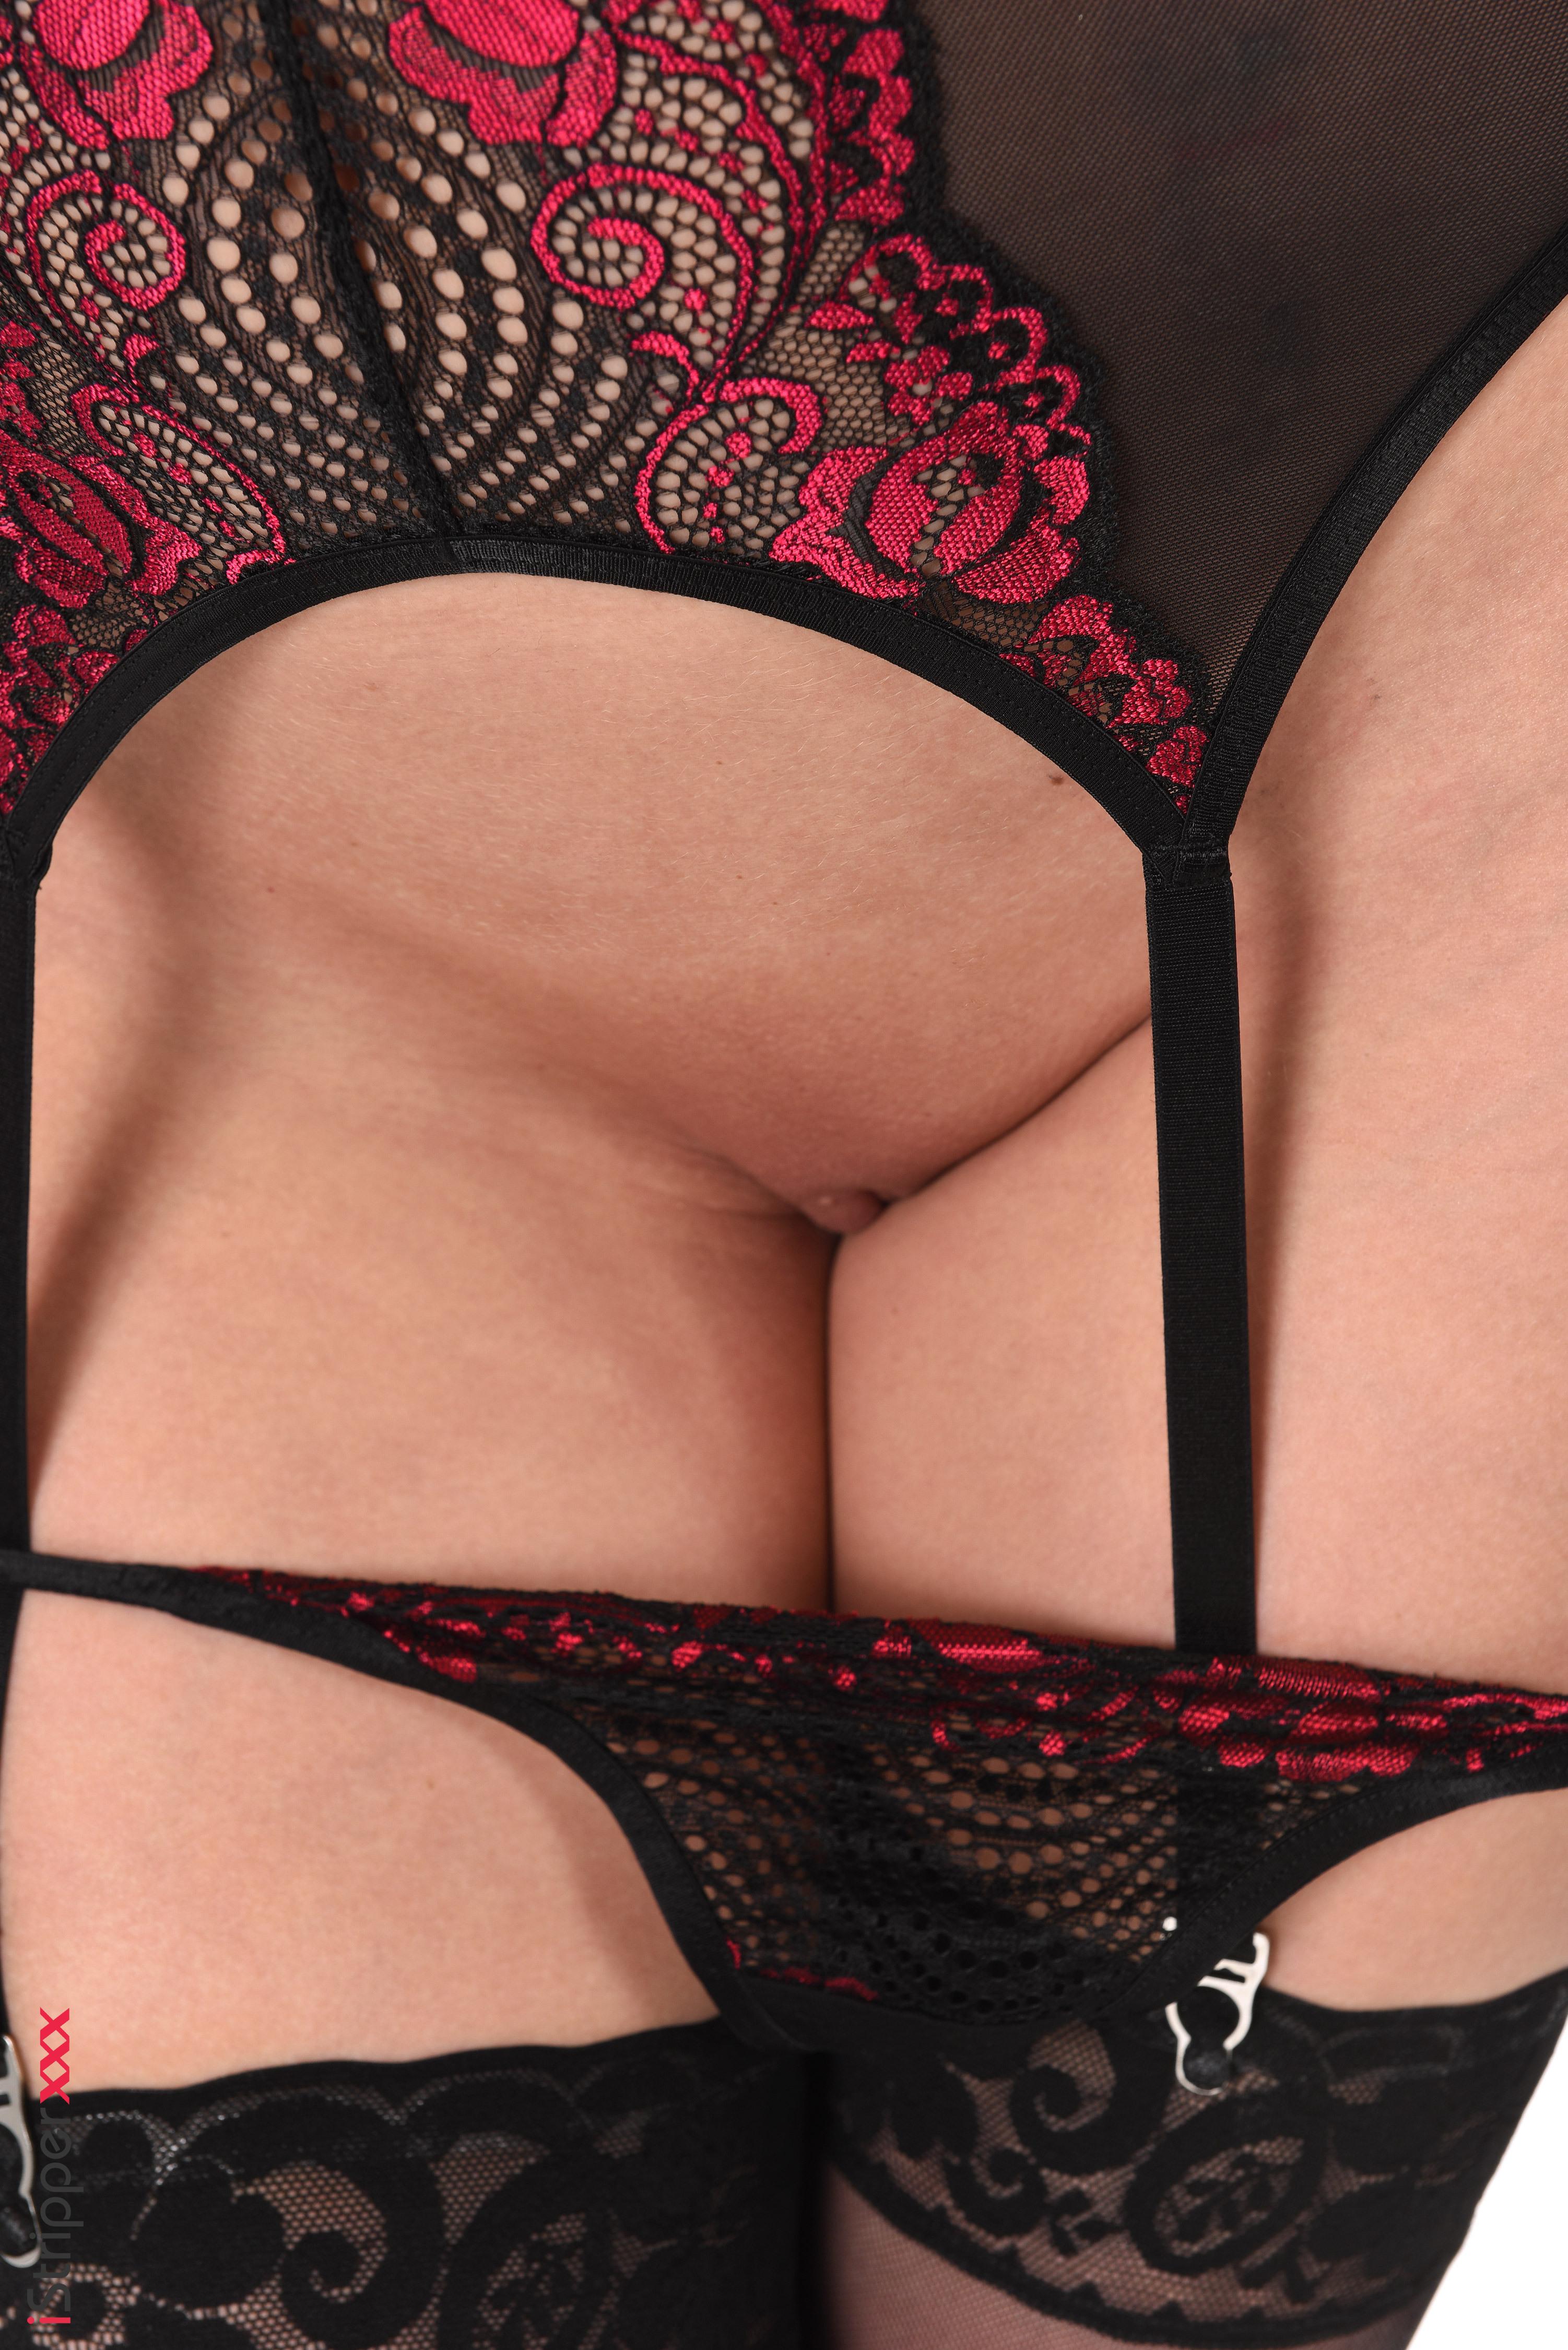 sexy lingerie wallpaper